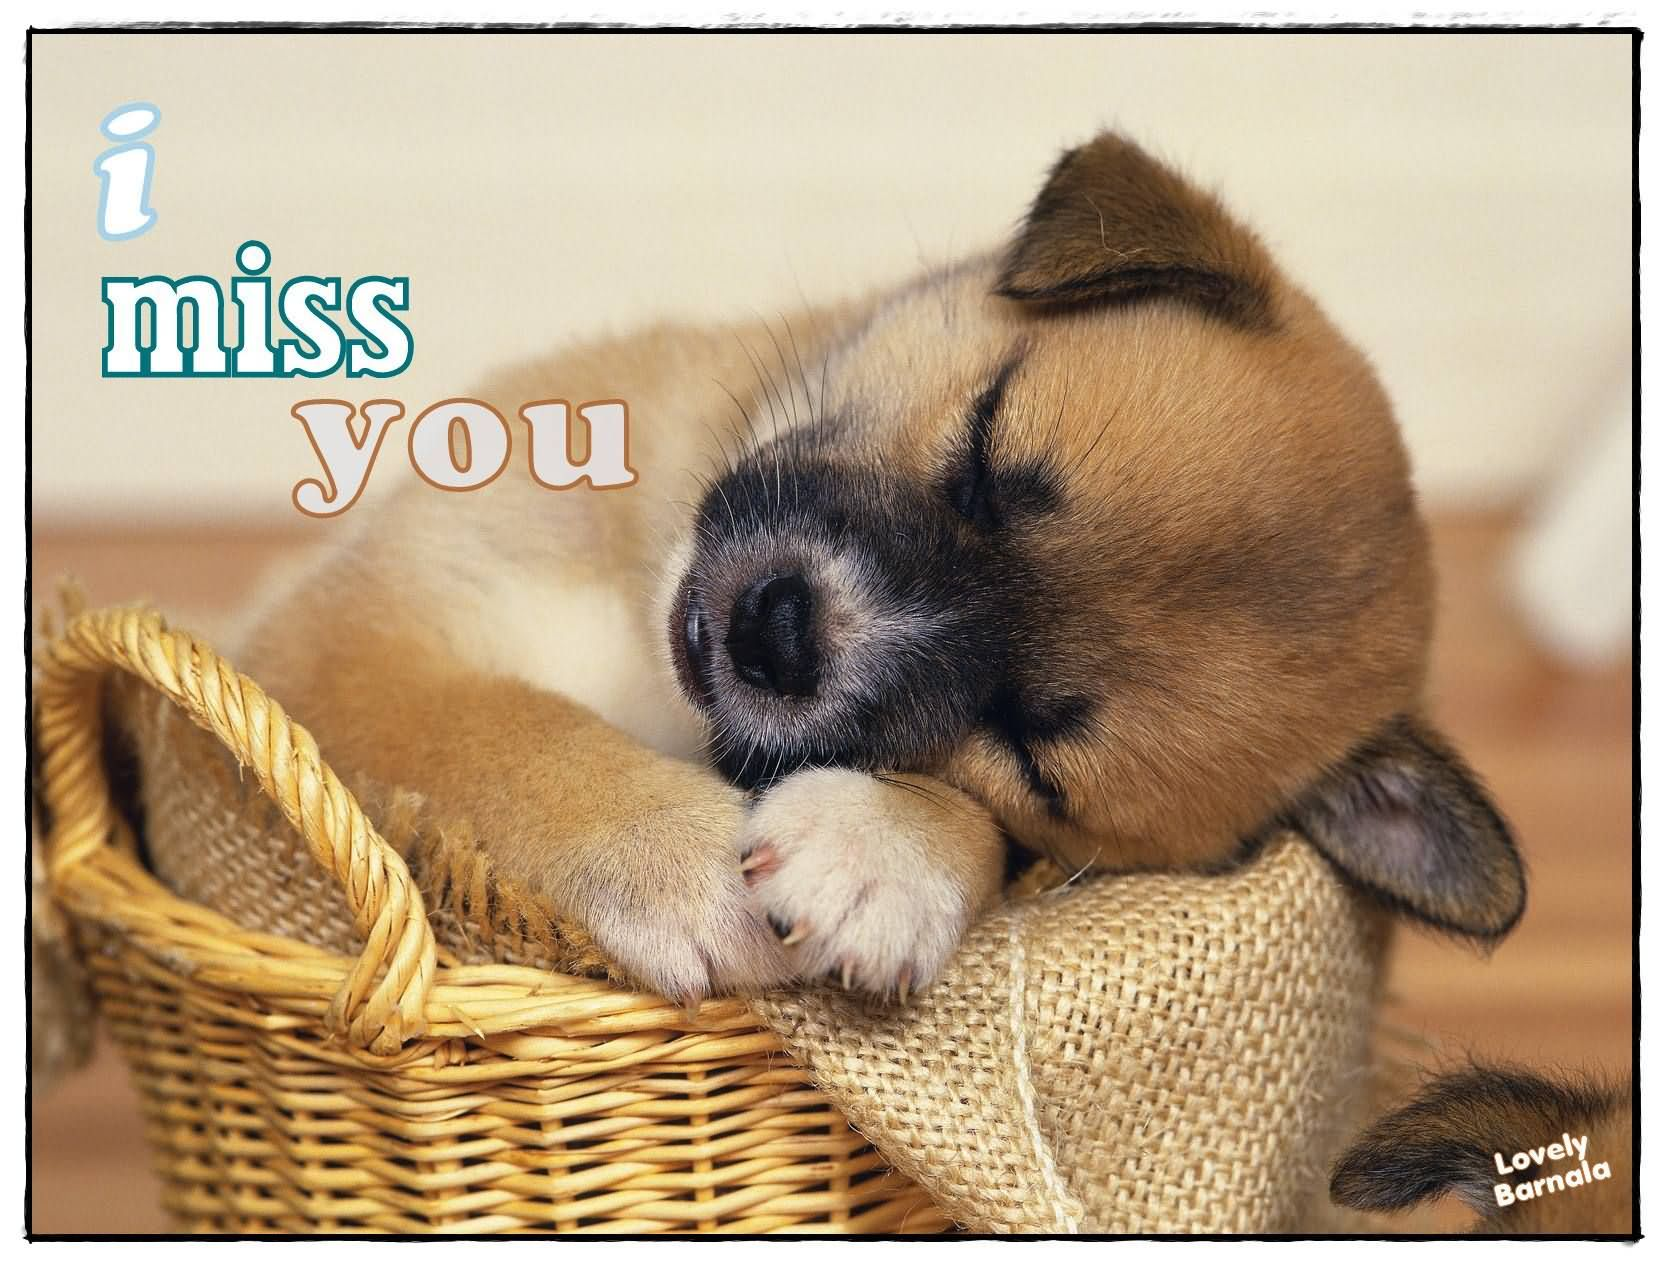 I Miss You Sleeping Puppy Image